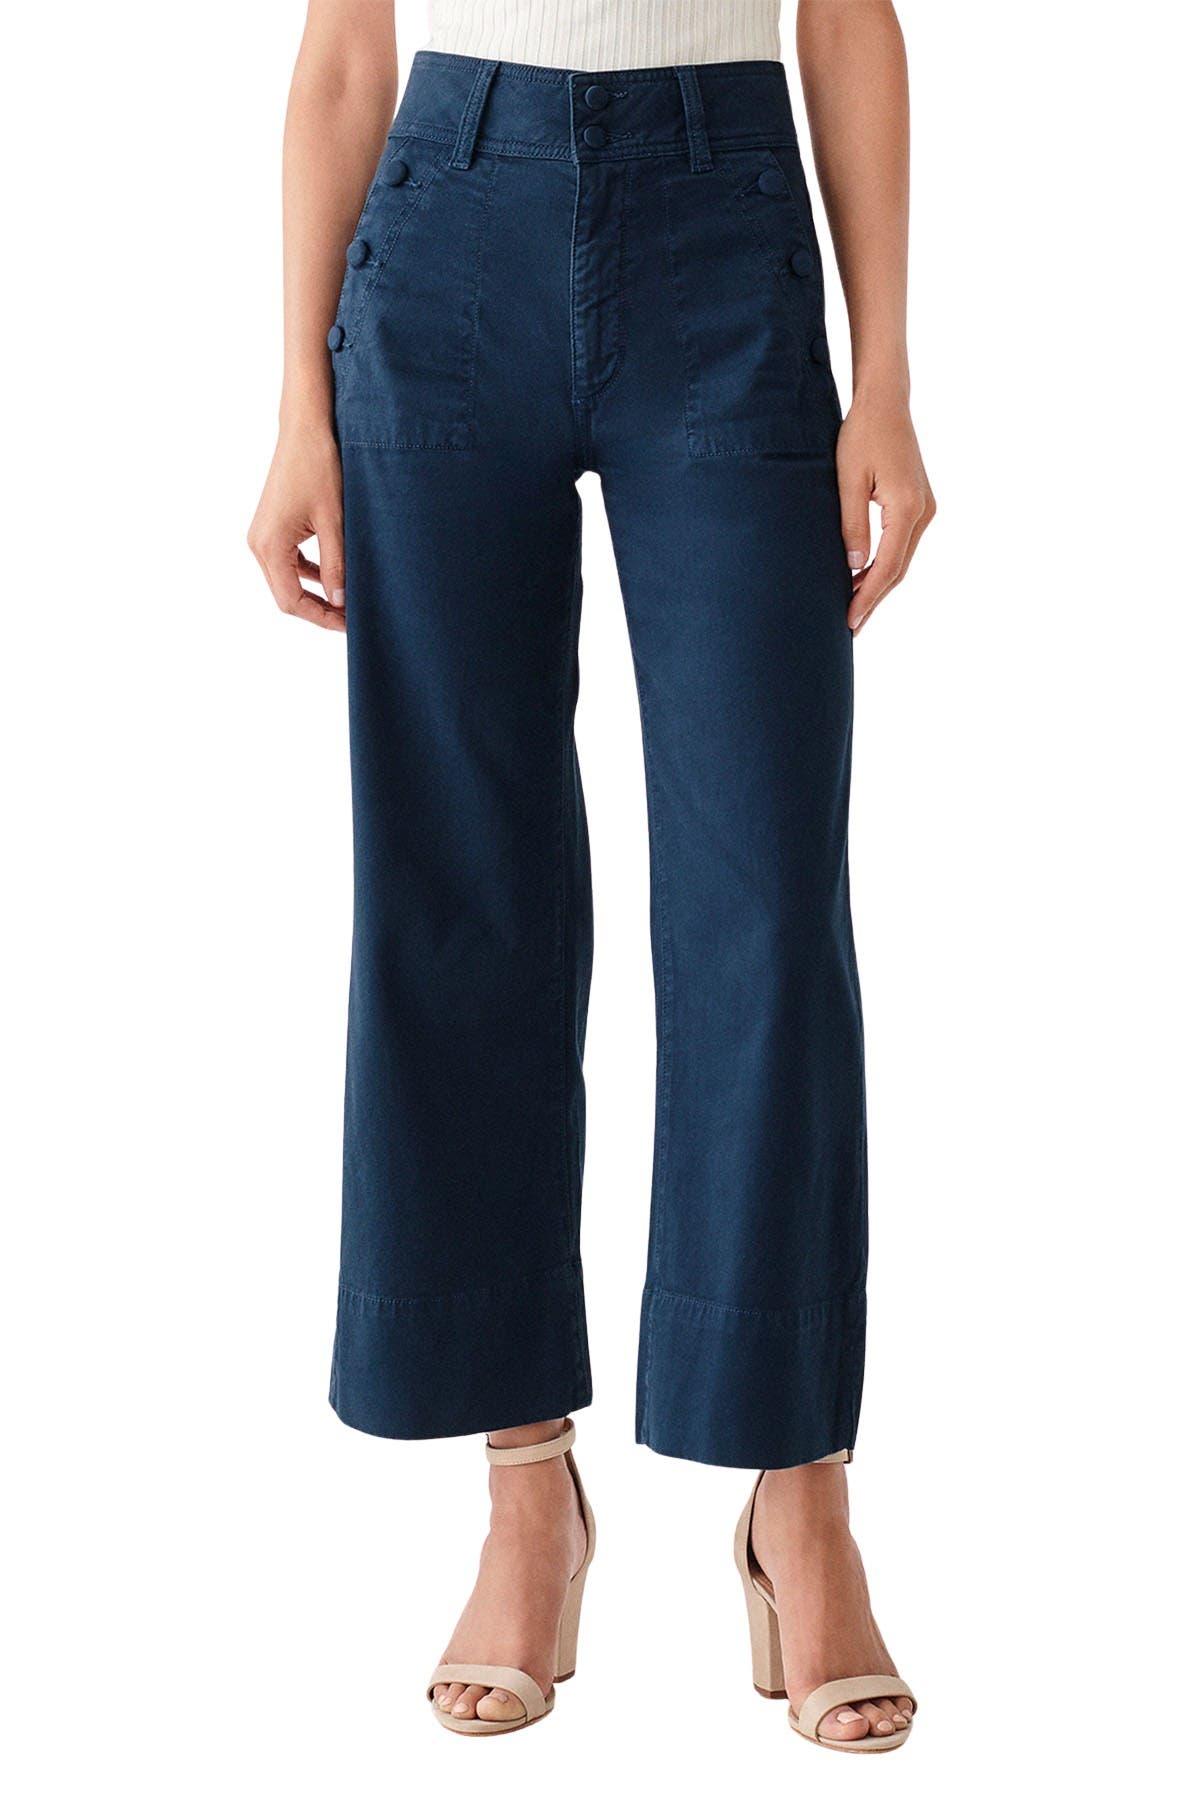 DL1961 Womens Hepburn High Rise Wide Leg Jeans